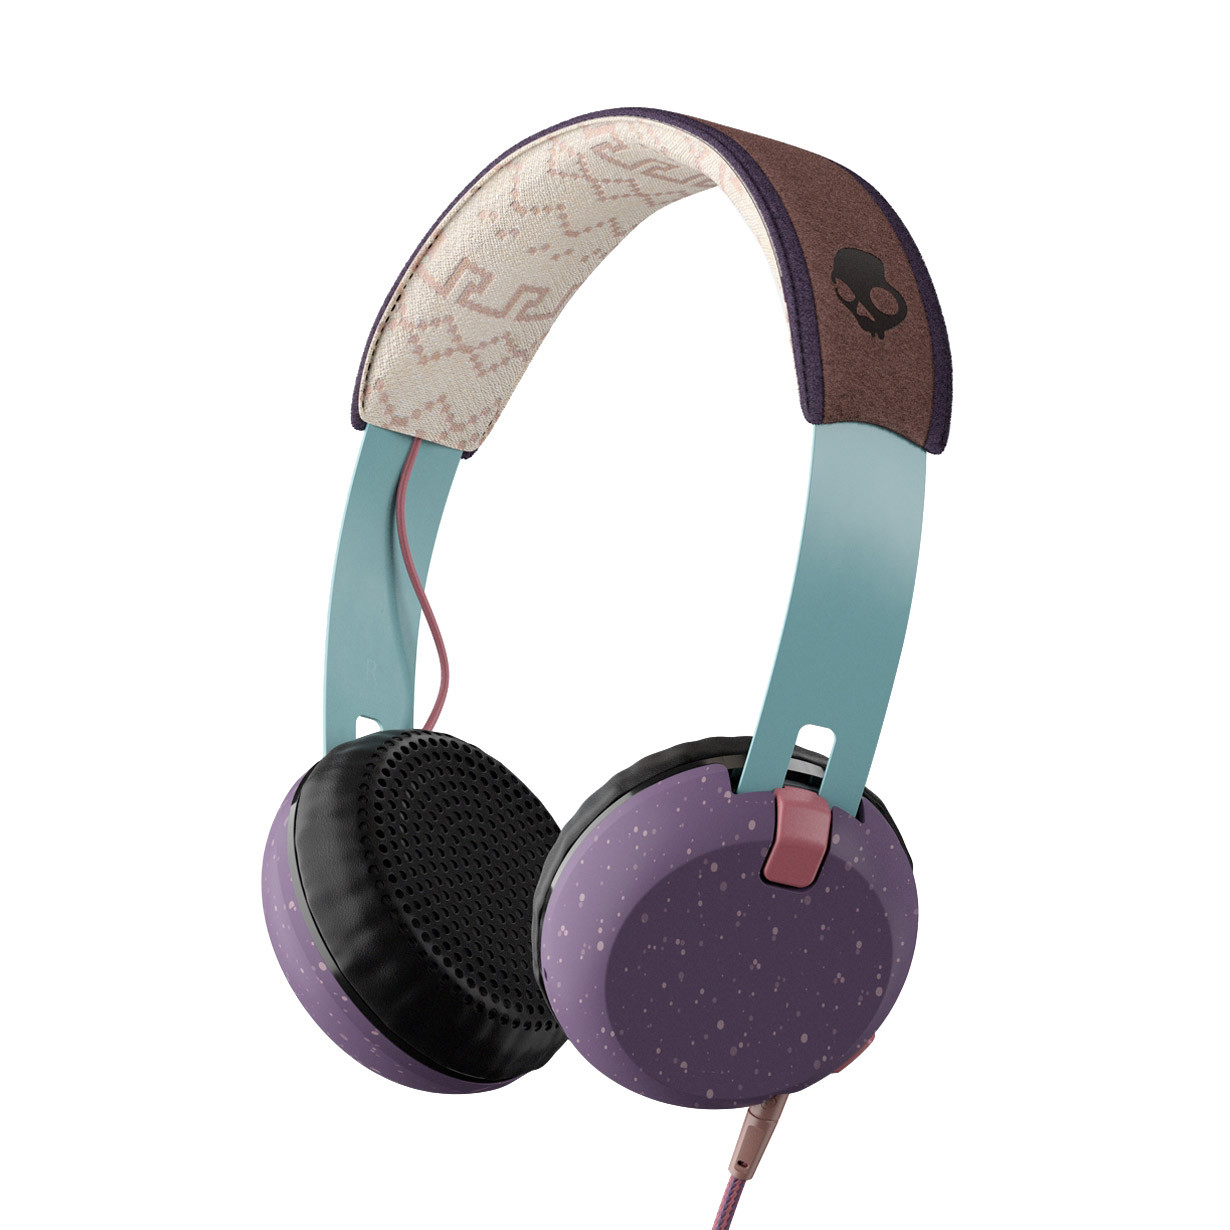 Sluchátka Skullcandy Grind purple/teal/brown